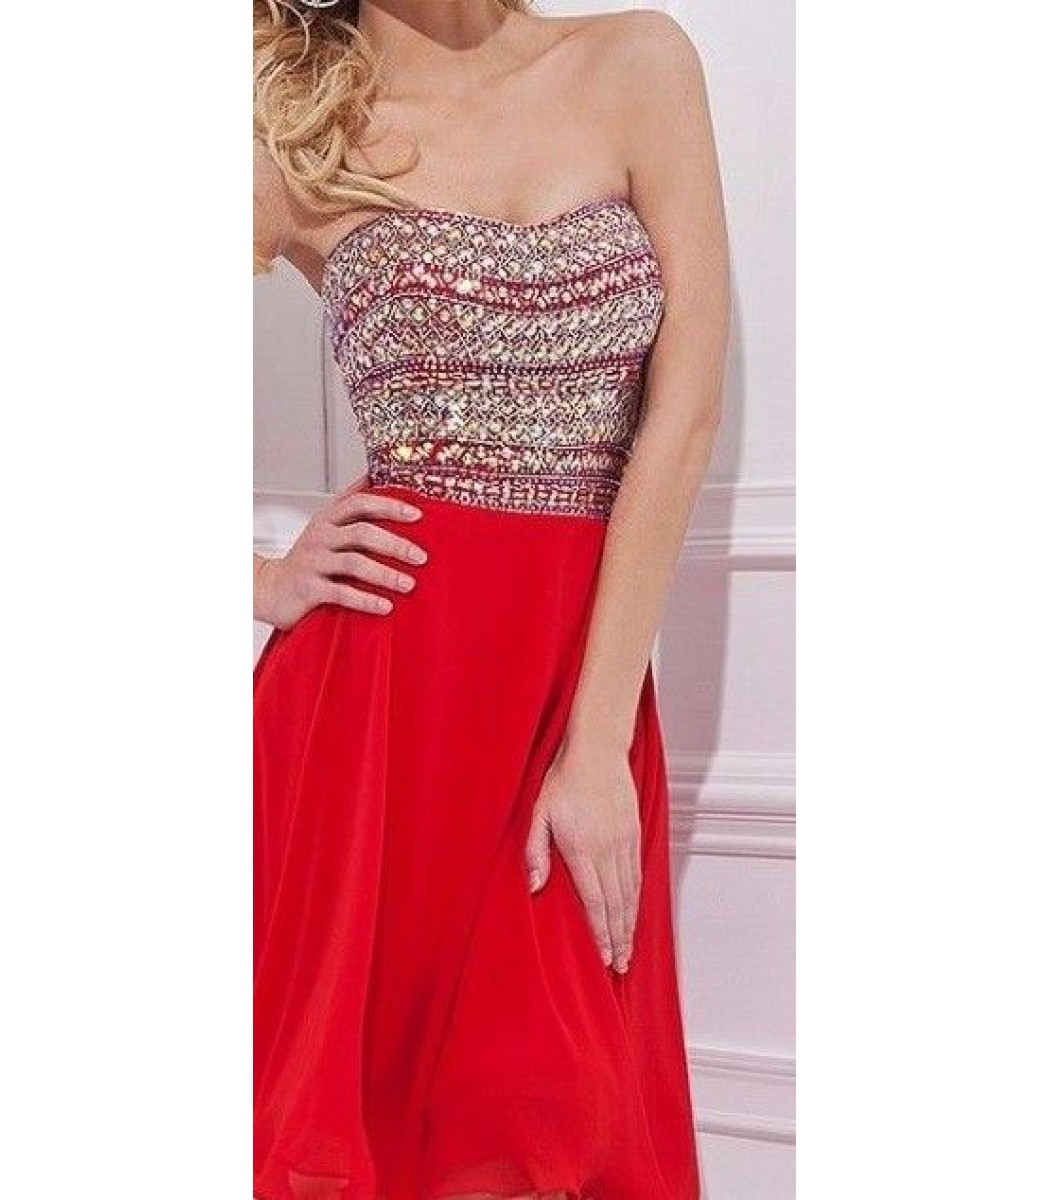 455a08ed4f1 Tony Bowls TS21457 Red Tube Top Short Dress Size 10 New NWT Prom.  262.50